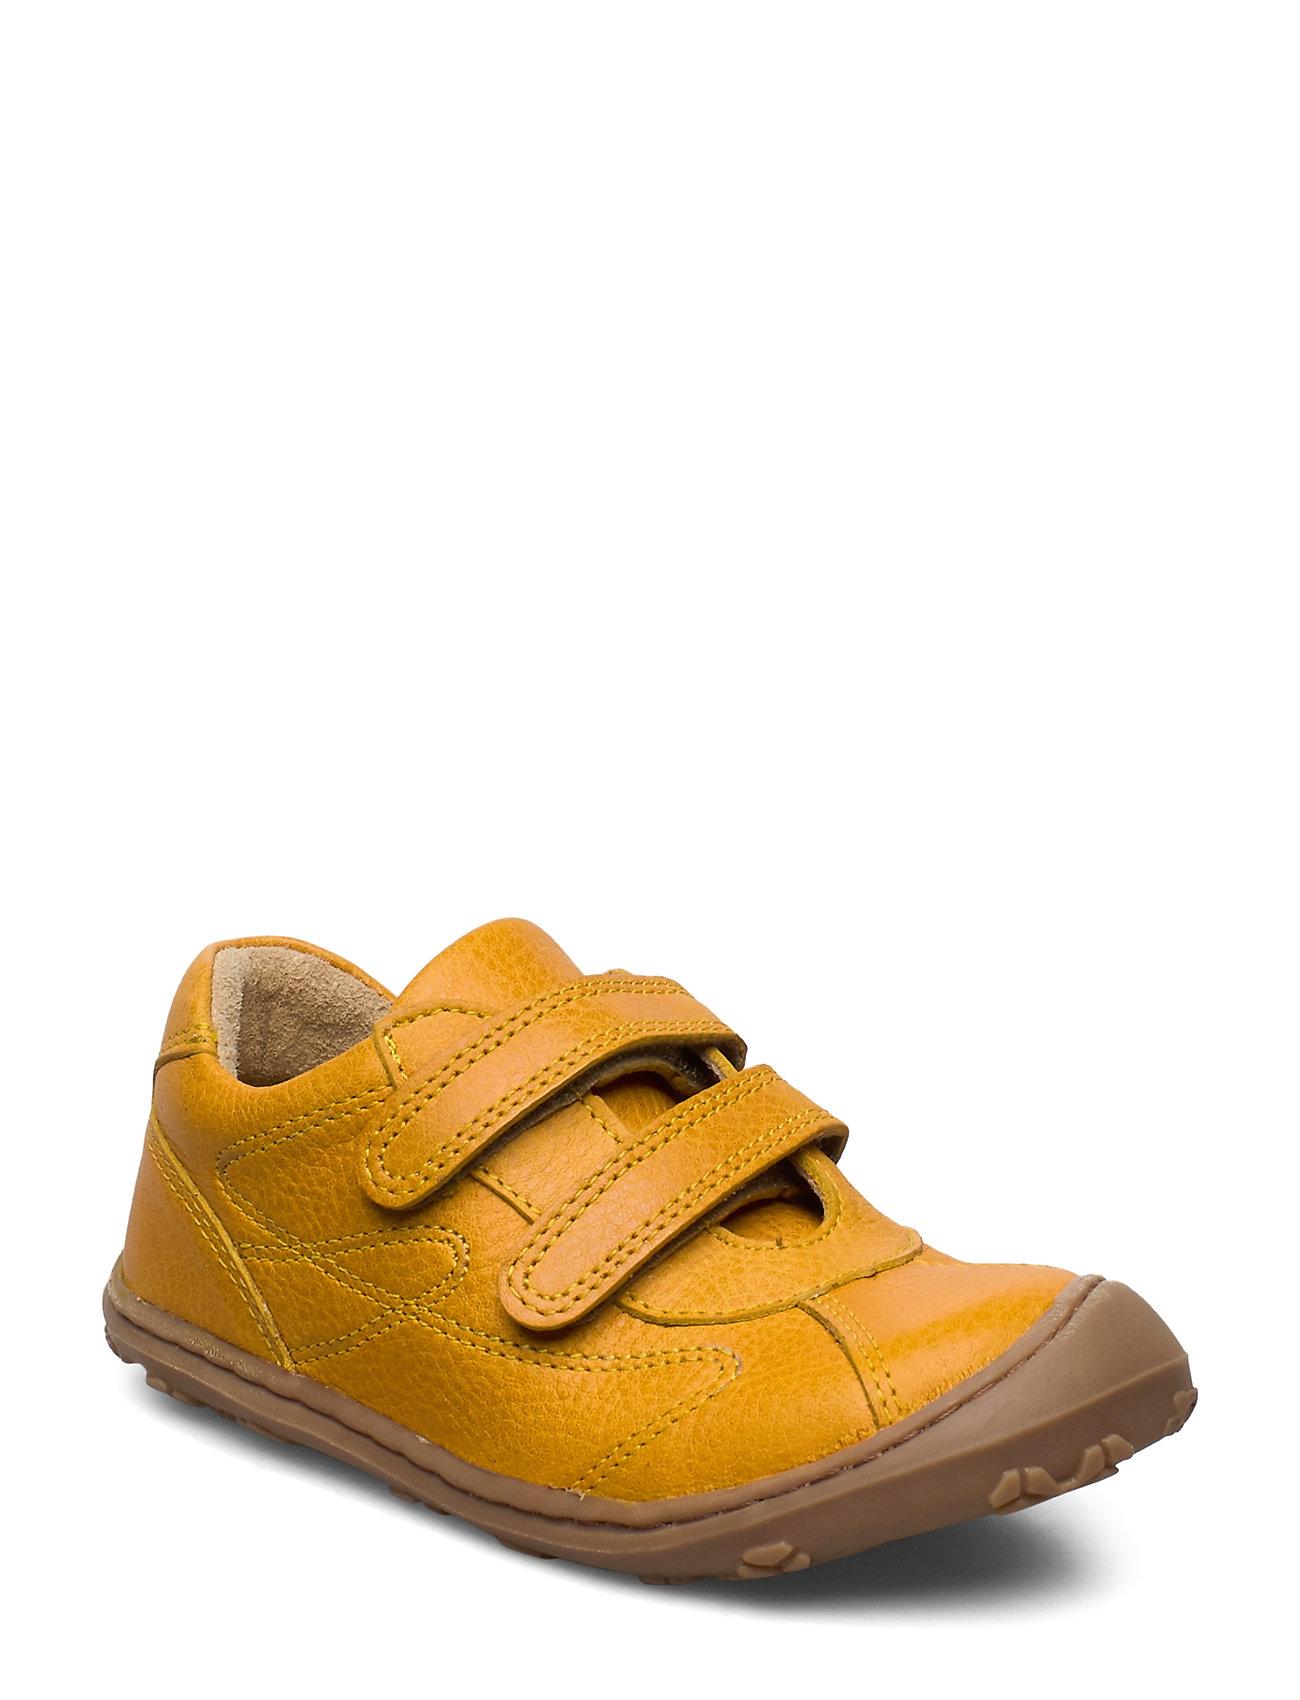 Image of Hand Made Shoe Sneakers Sko Gul Arauto RAP (3352579151)